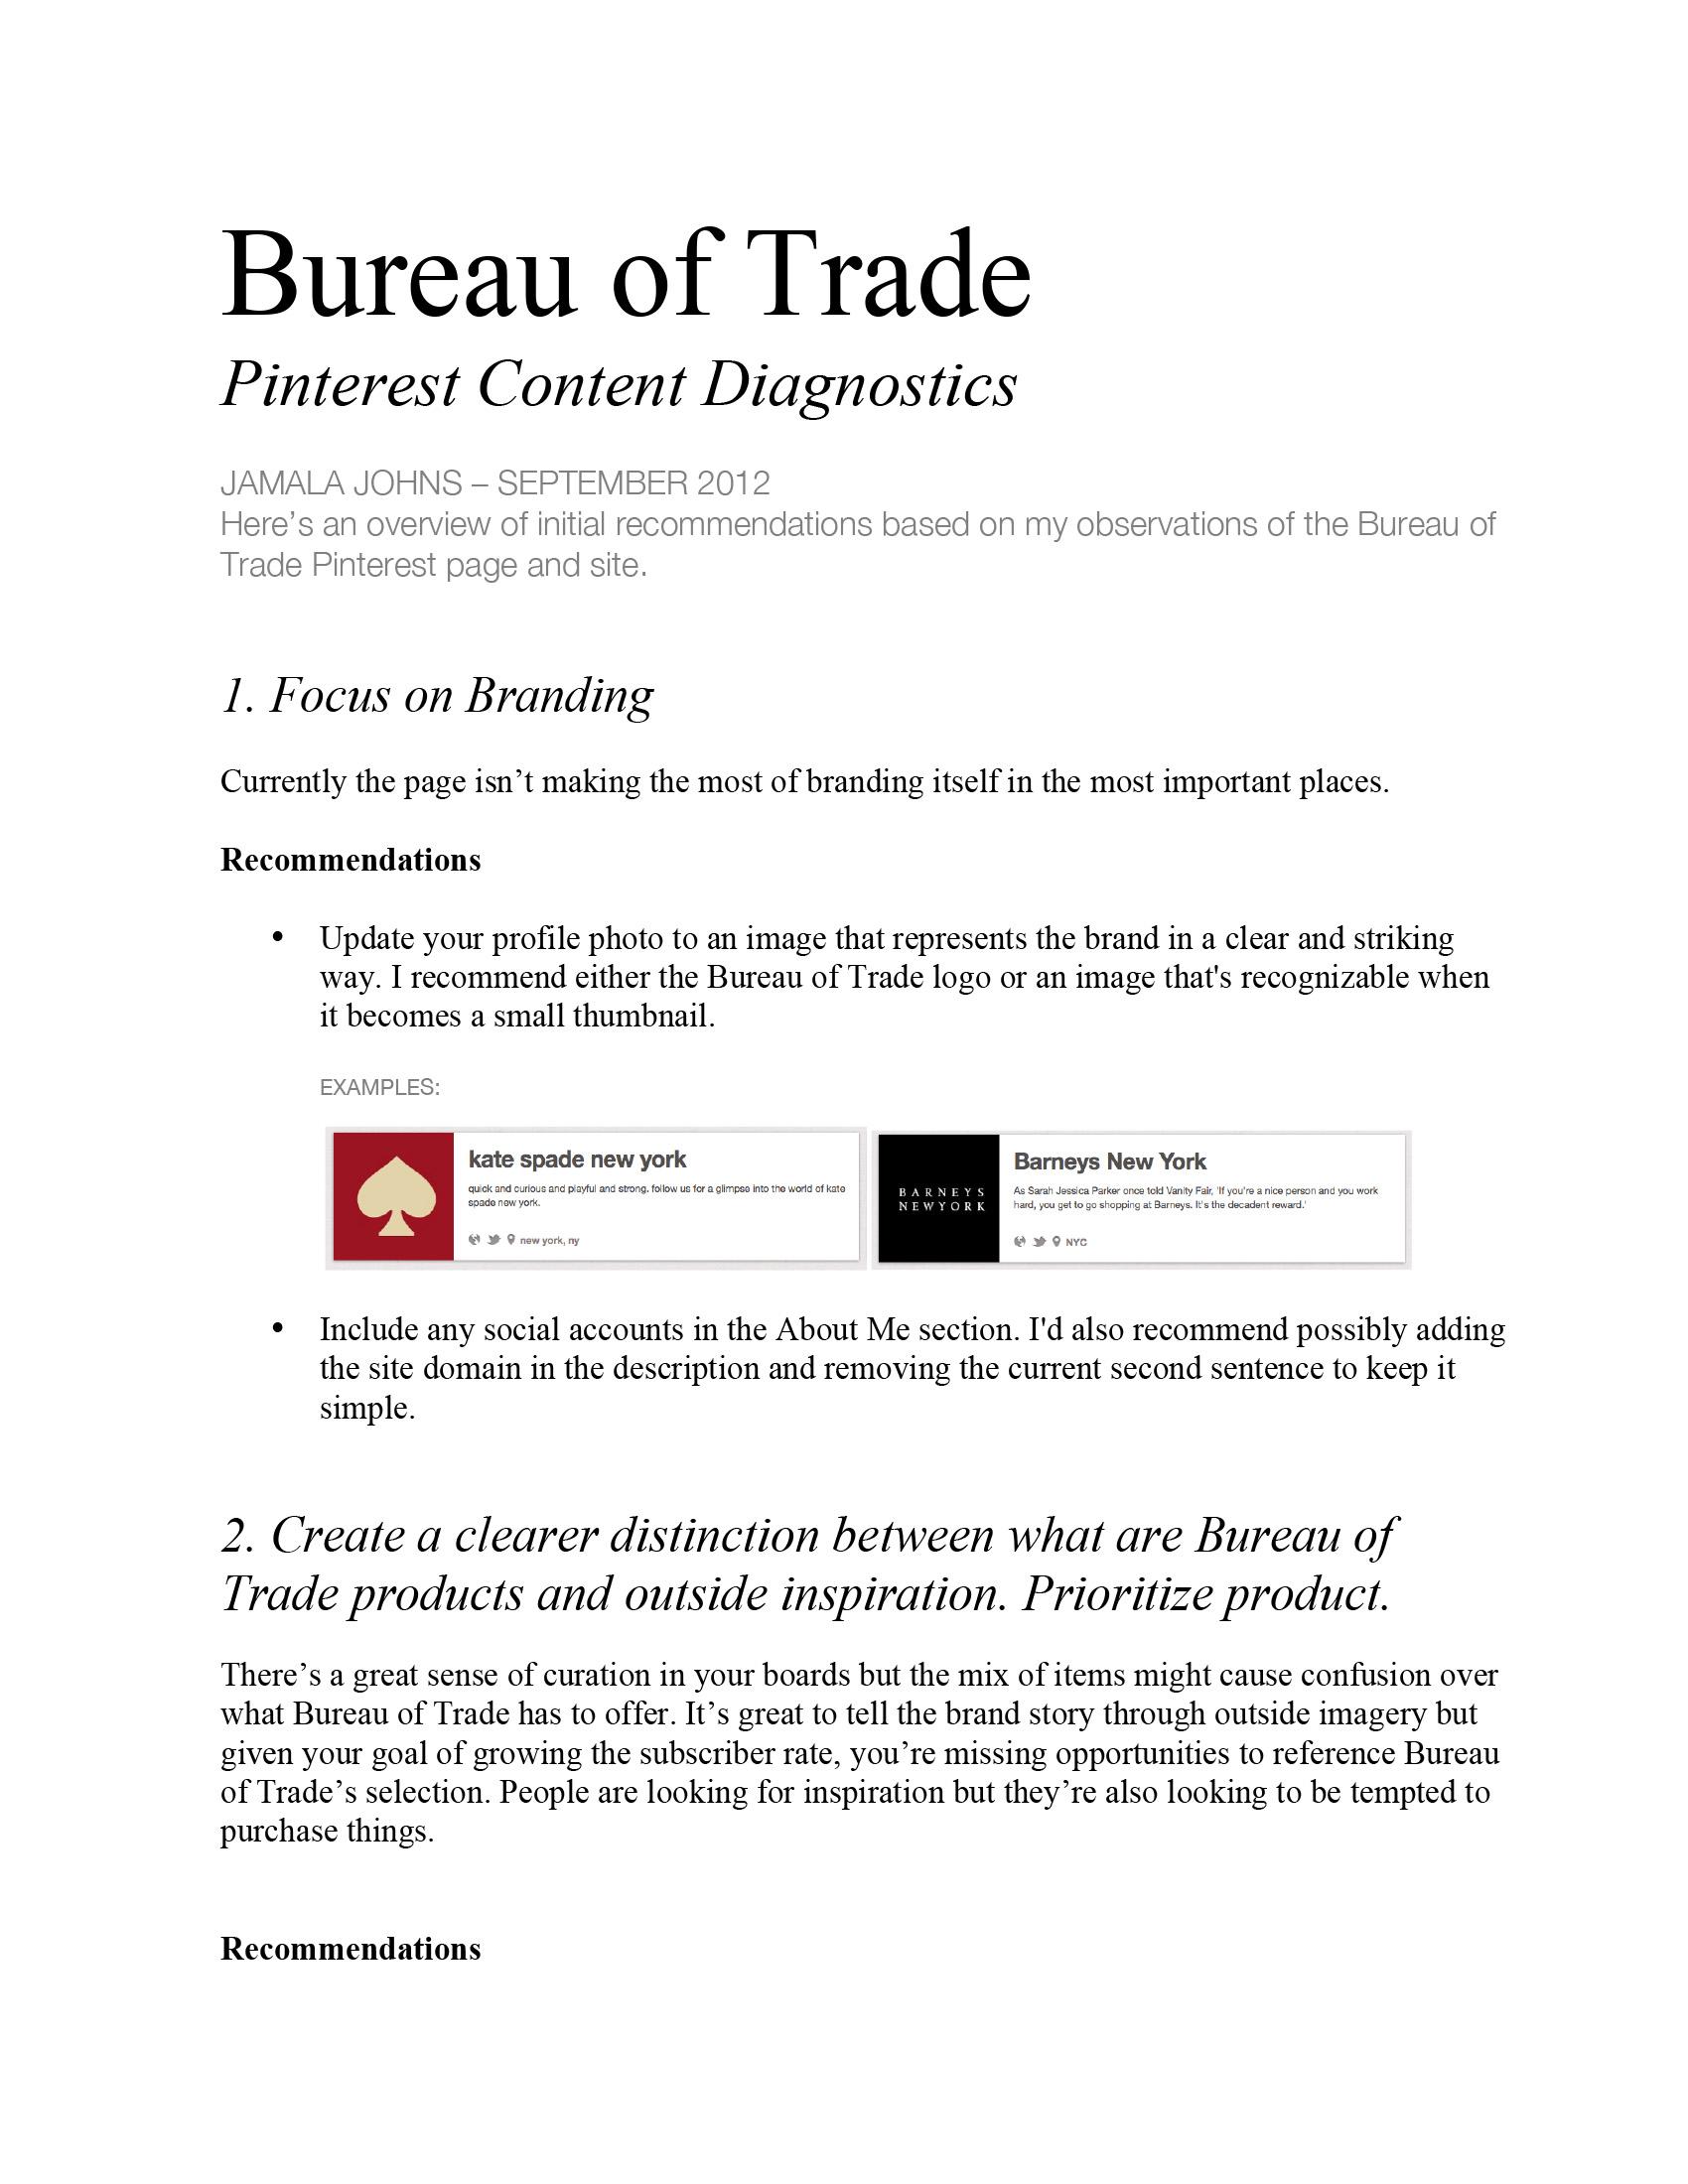 BureauofTrade_PinterestDiagnostics_01.jpg